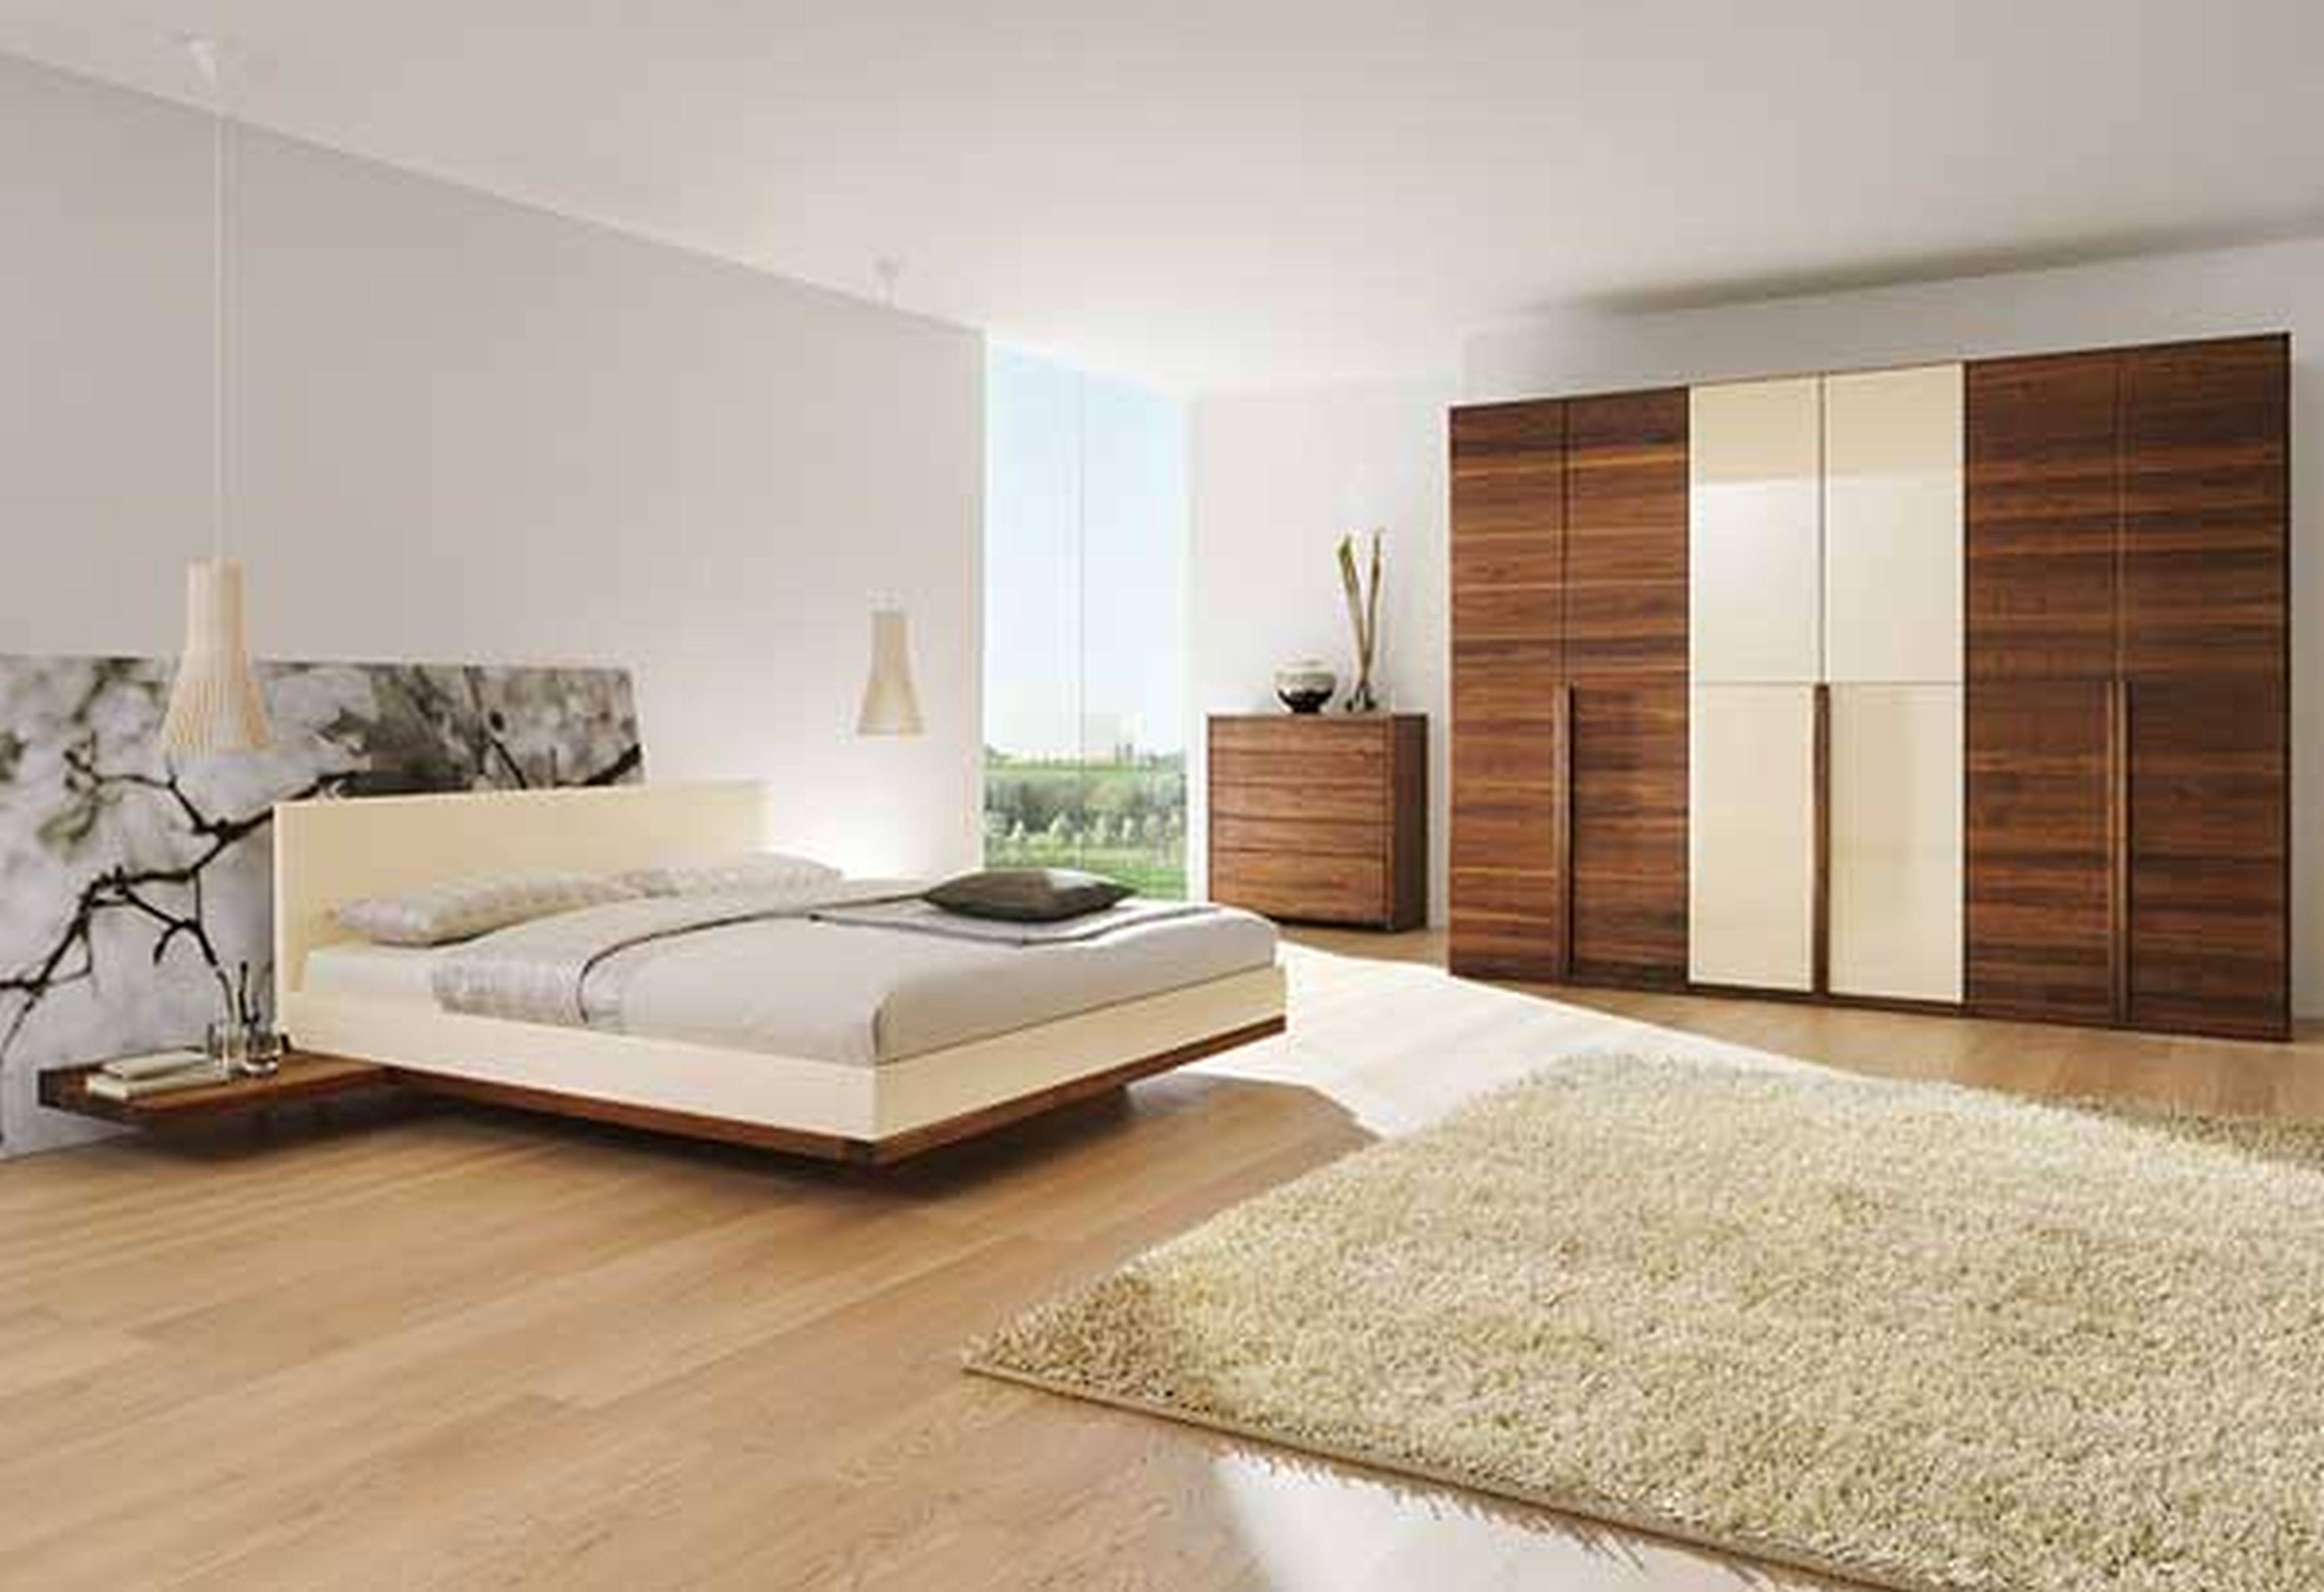 Bedroom : Elegant Storage Units For Kids Bedroom With Dark Brown for Dark Wood Wardrobe Sets (Image 5 of 30)